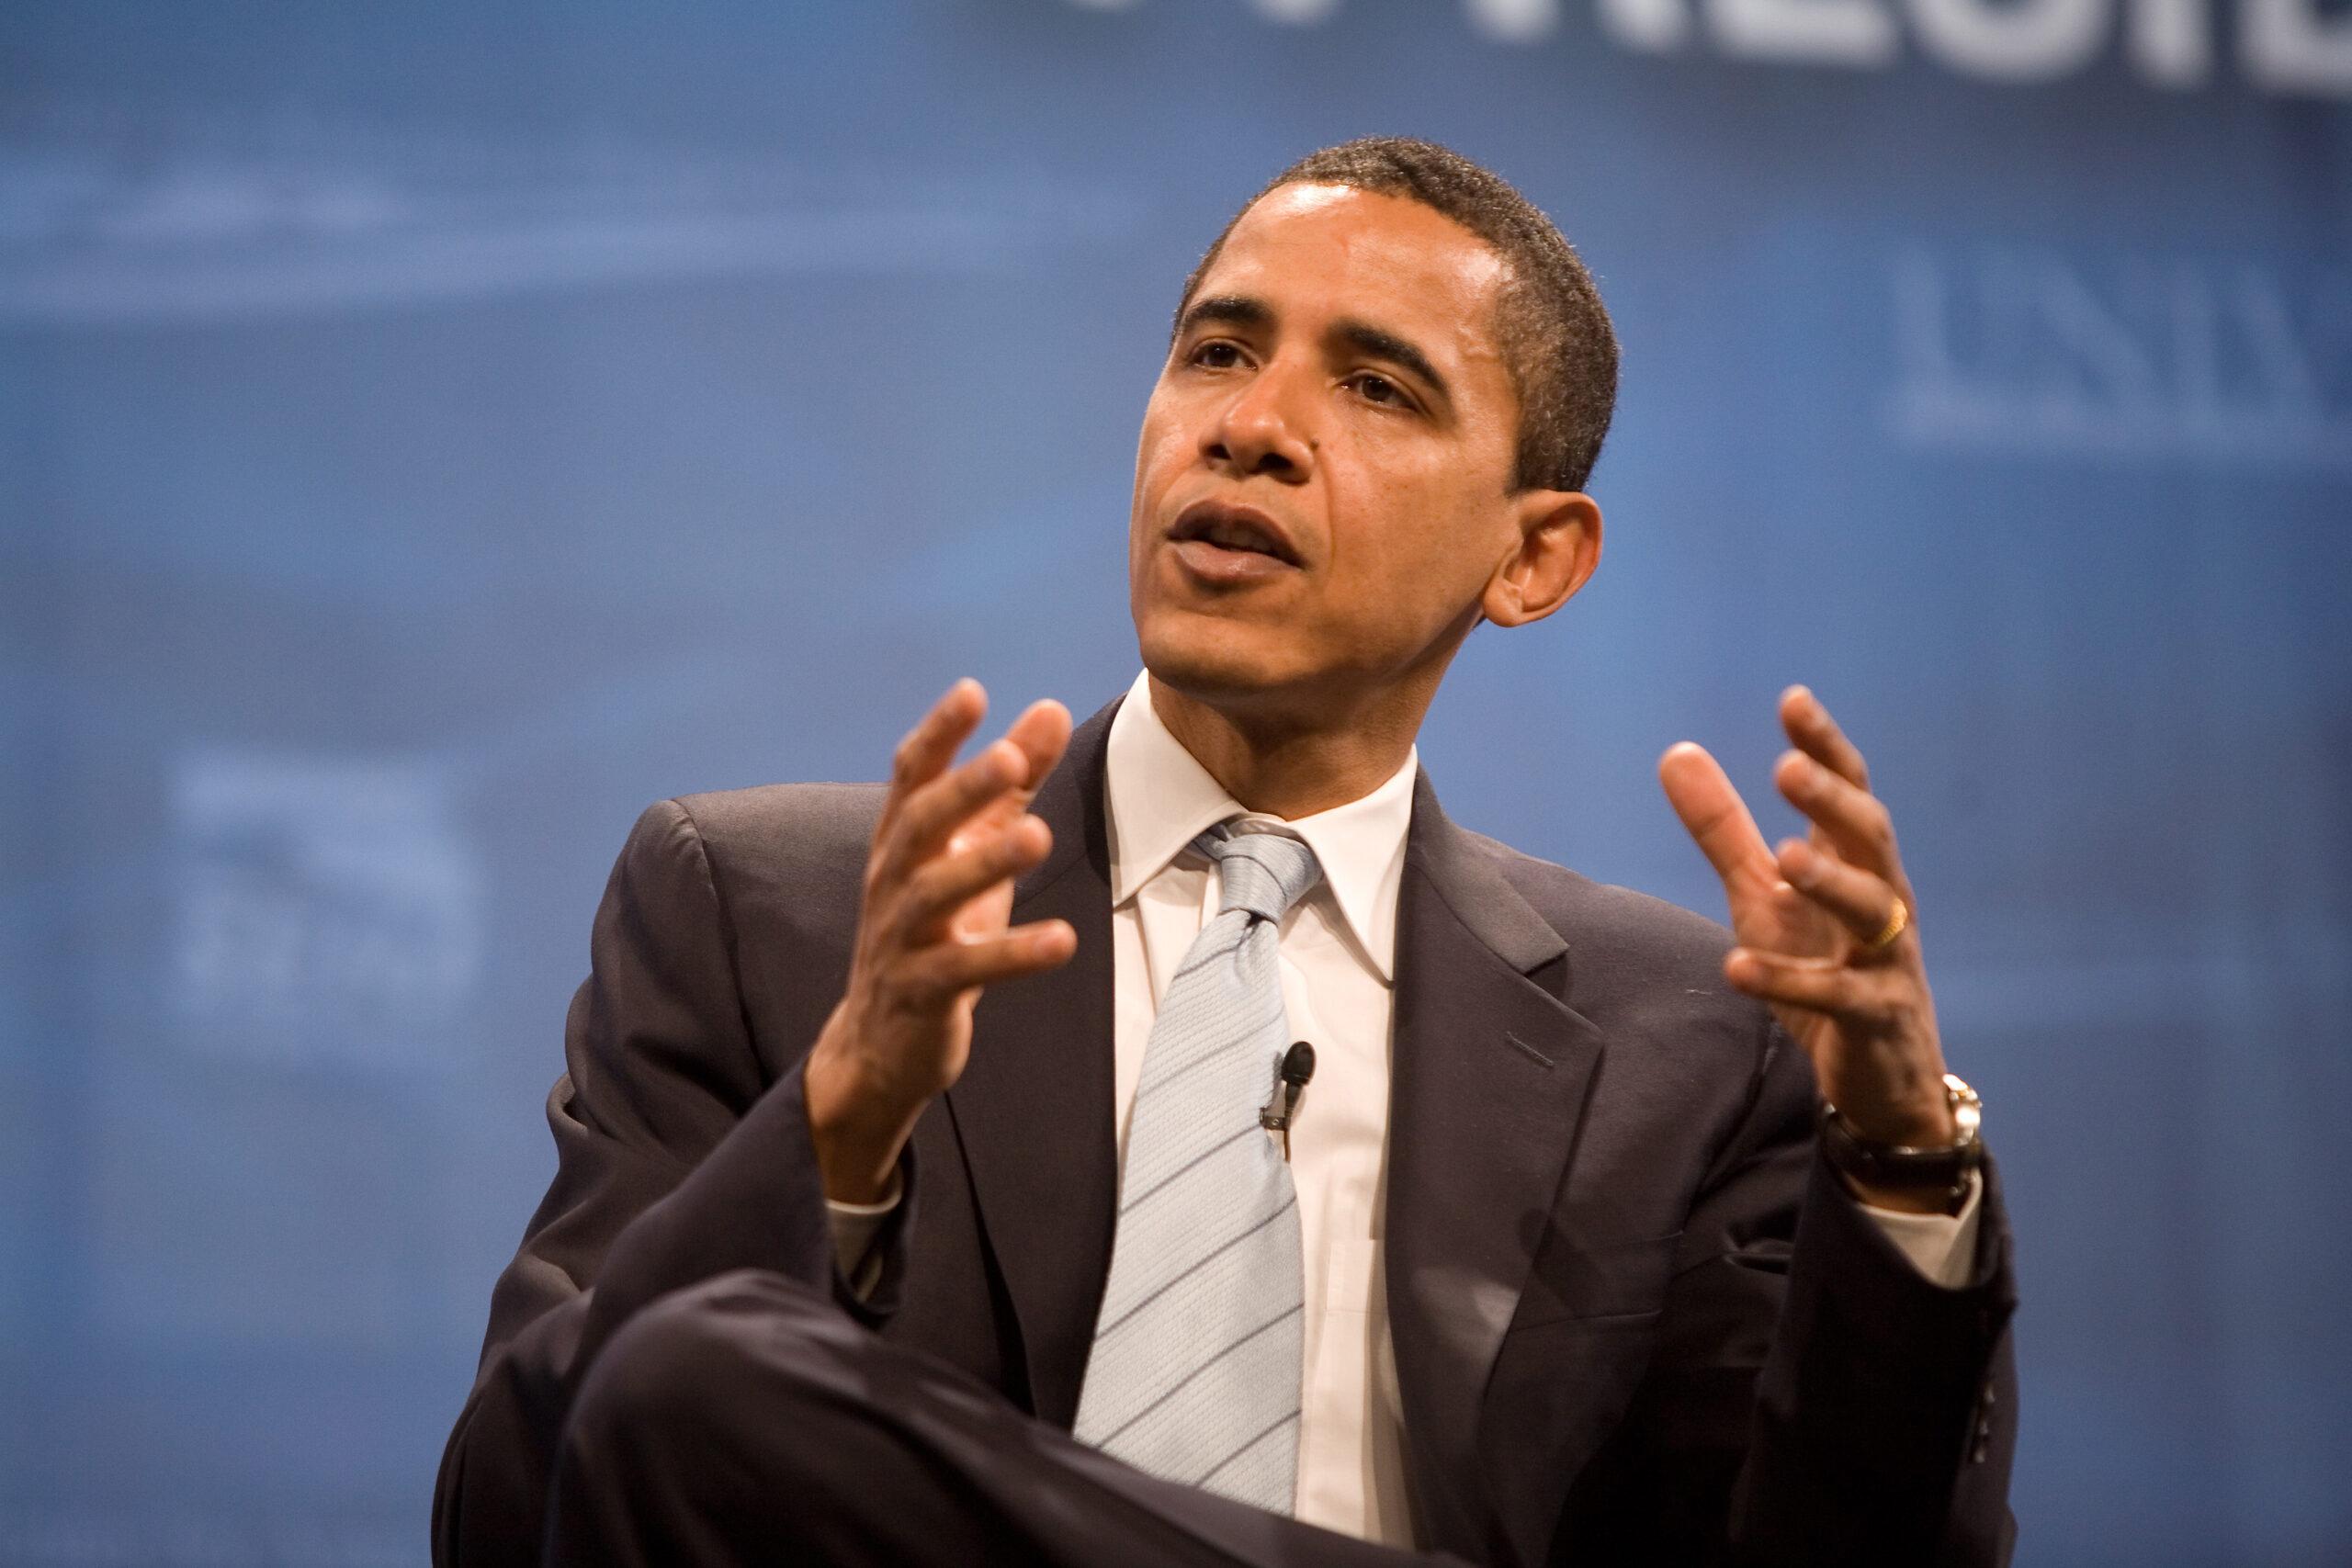 Obama criticizes GOP establishment